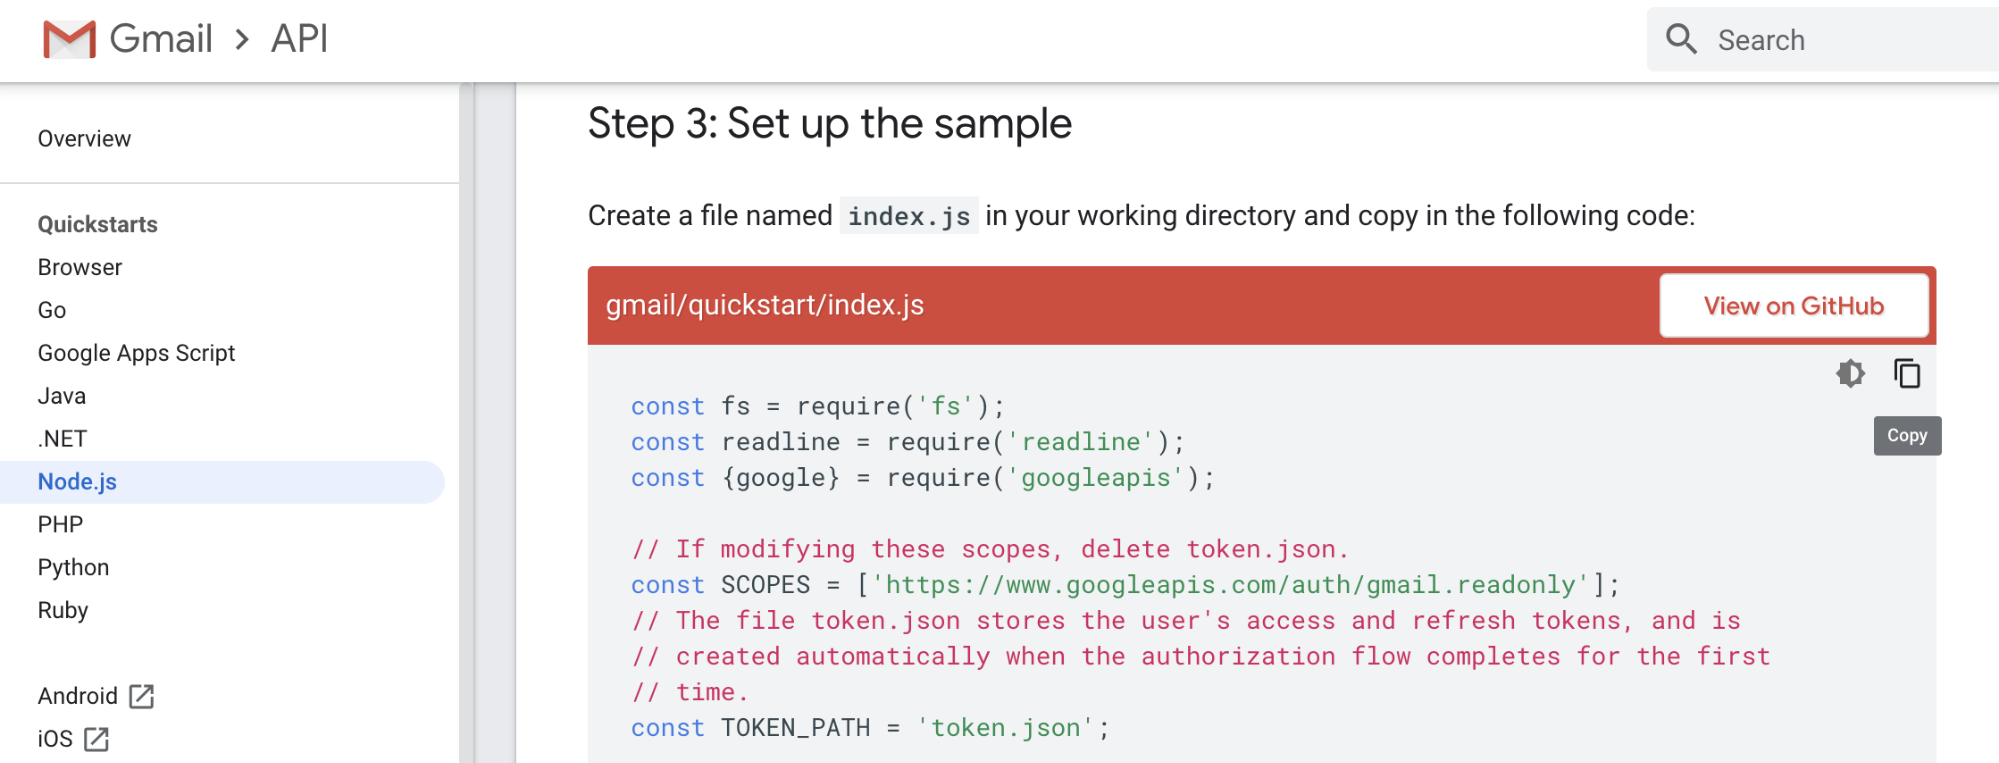 Gmail API Sample